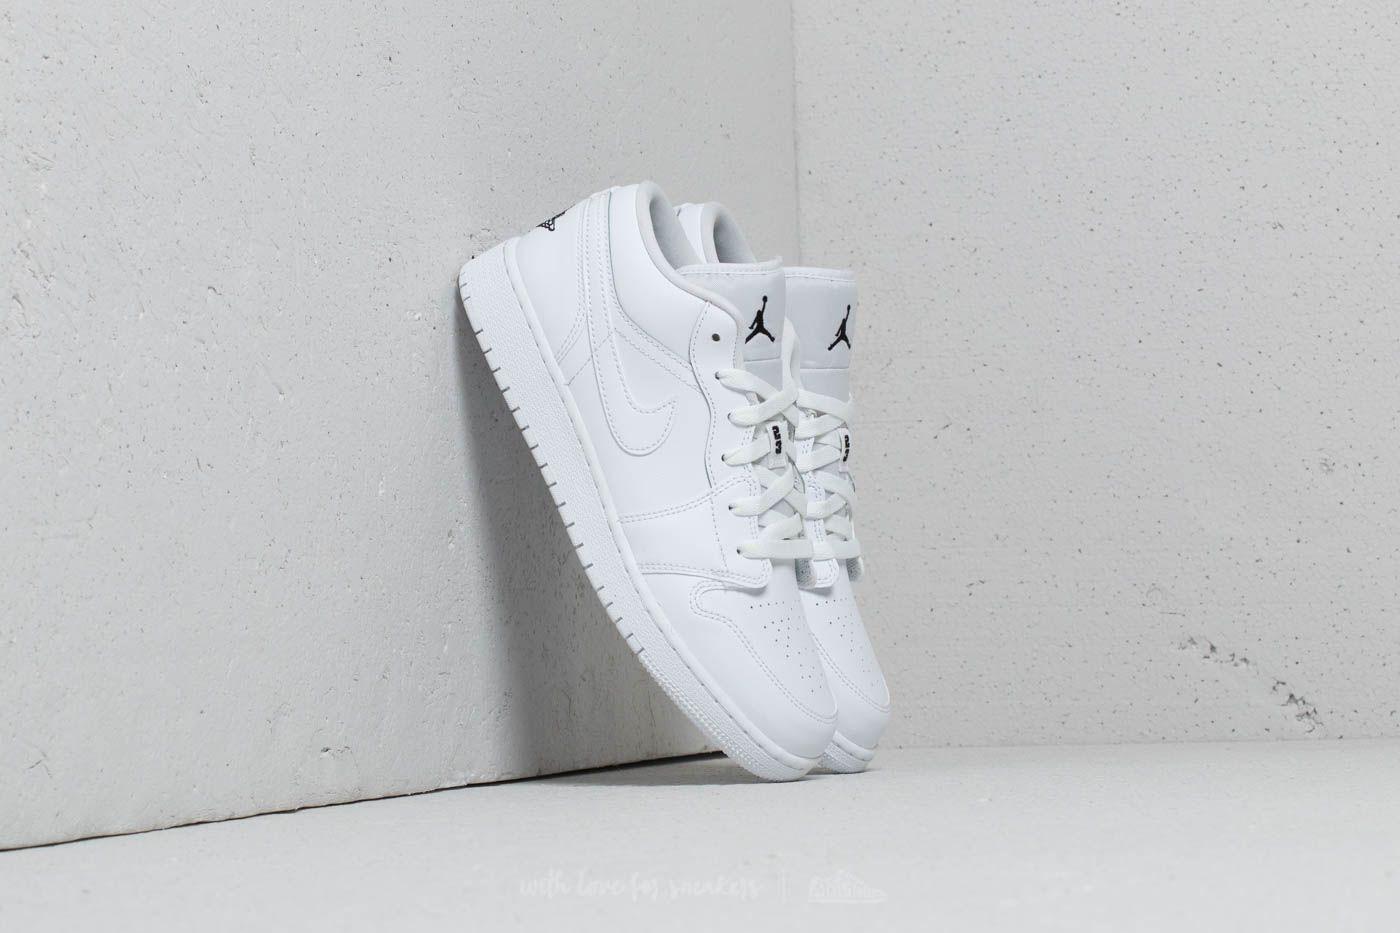 Air Jordan 1 Low BG White/ Black-White